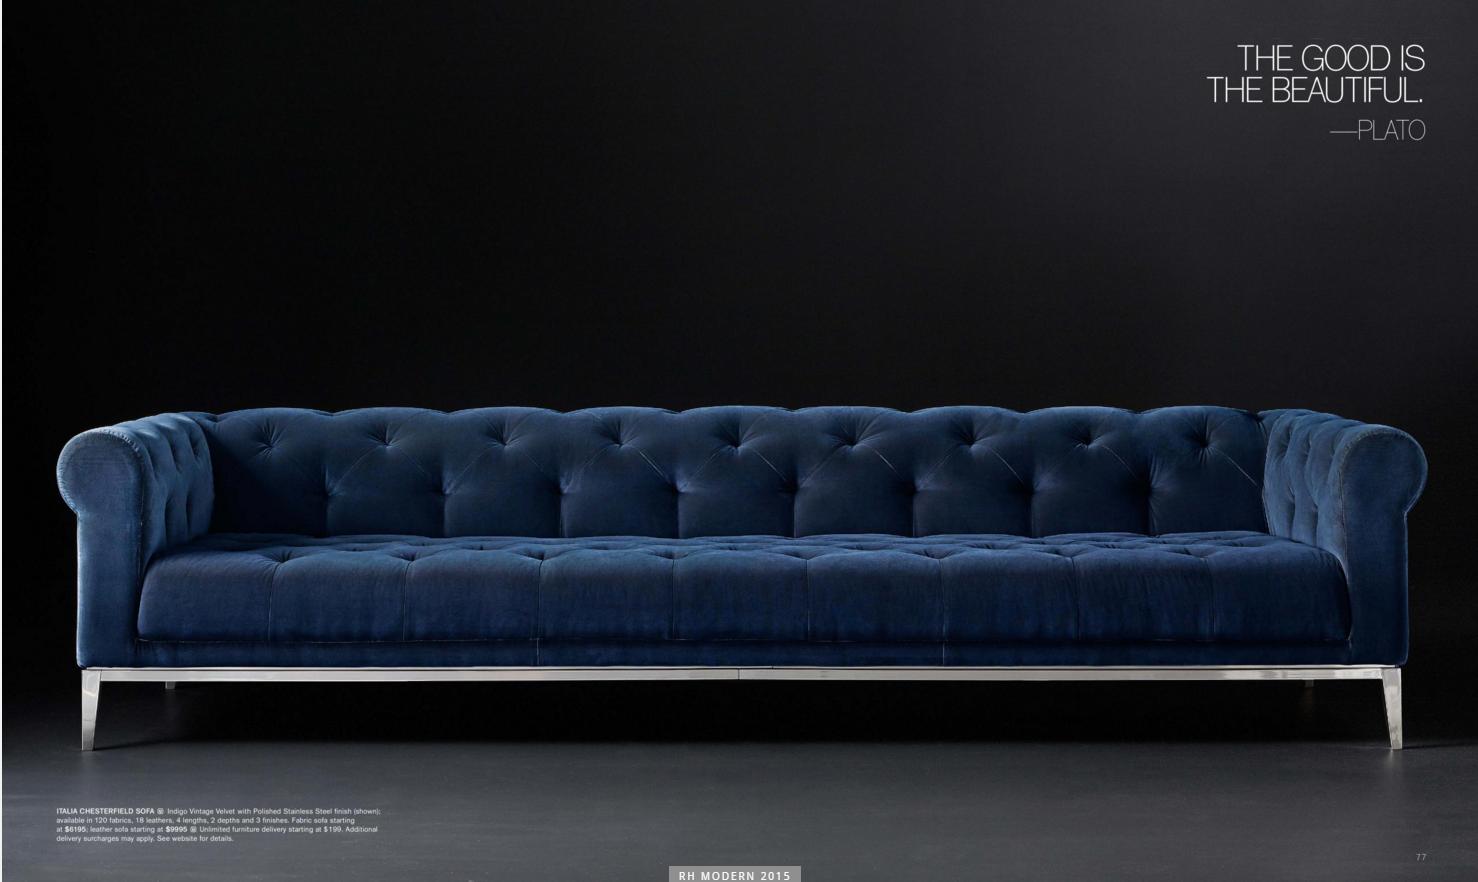 Italia Chesterfield Sofa From Rh Modern